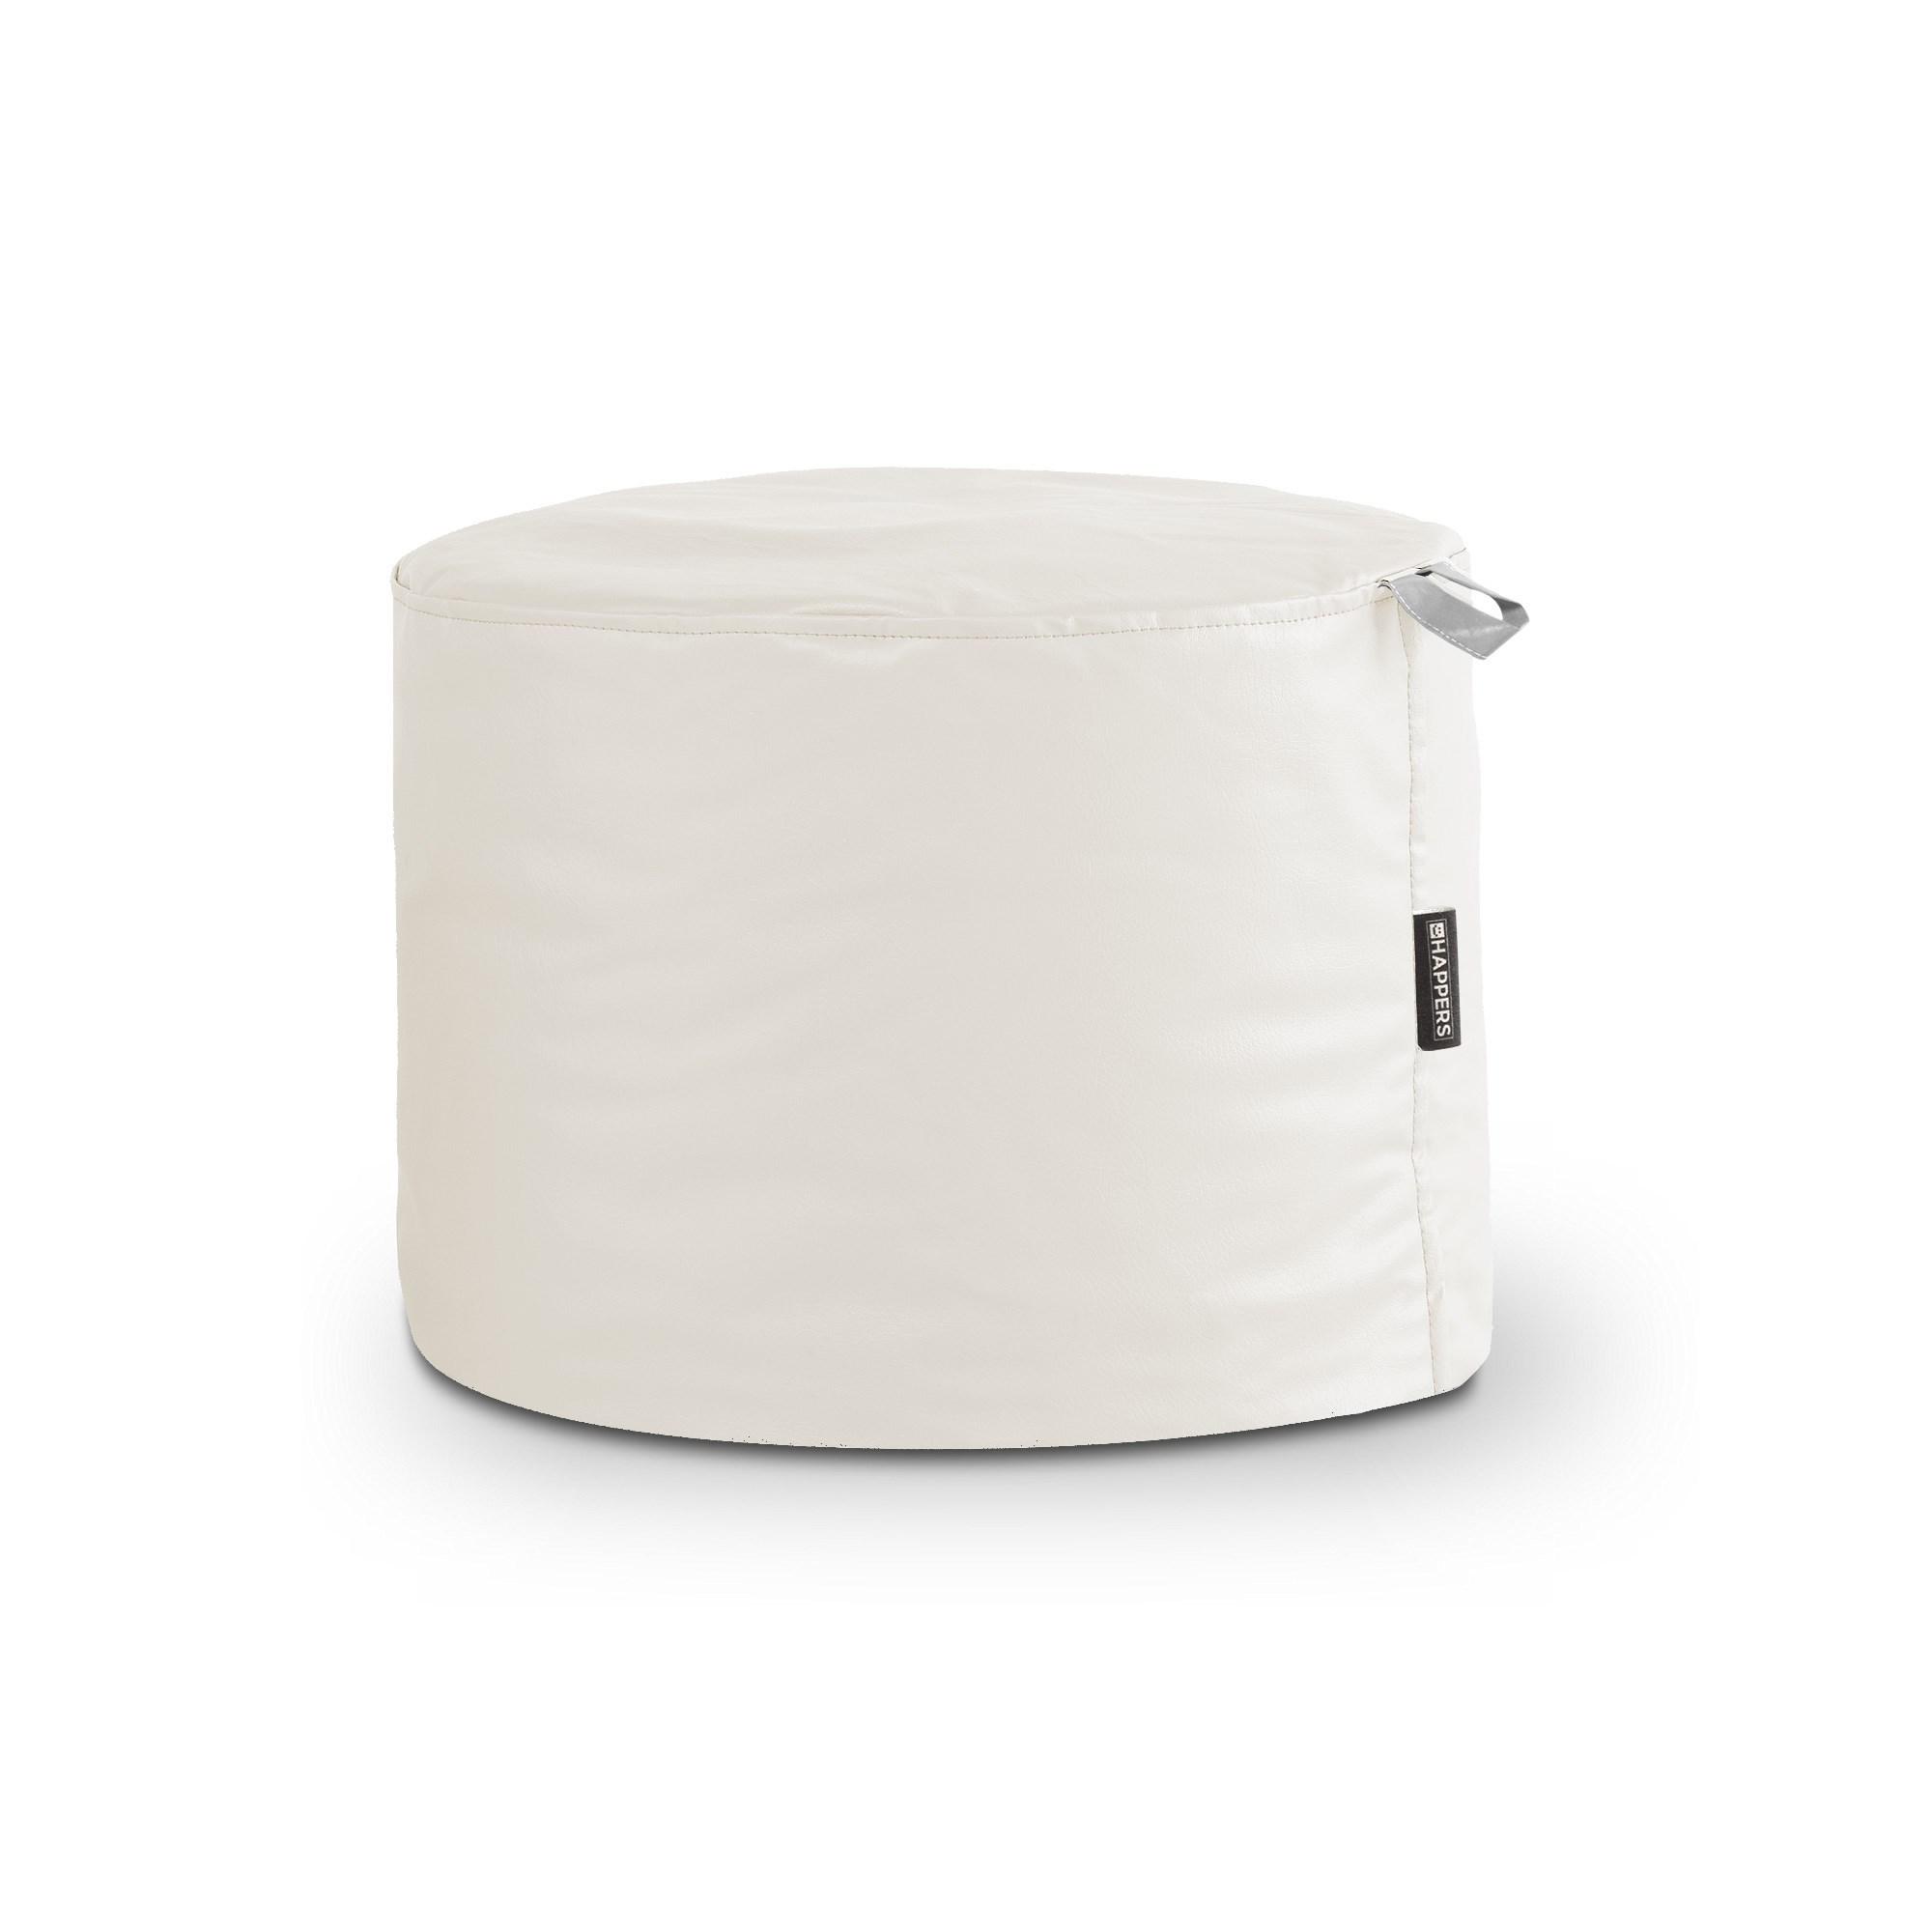 puff taburete polipiel outdoor blanco happers | happers.es